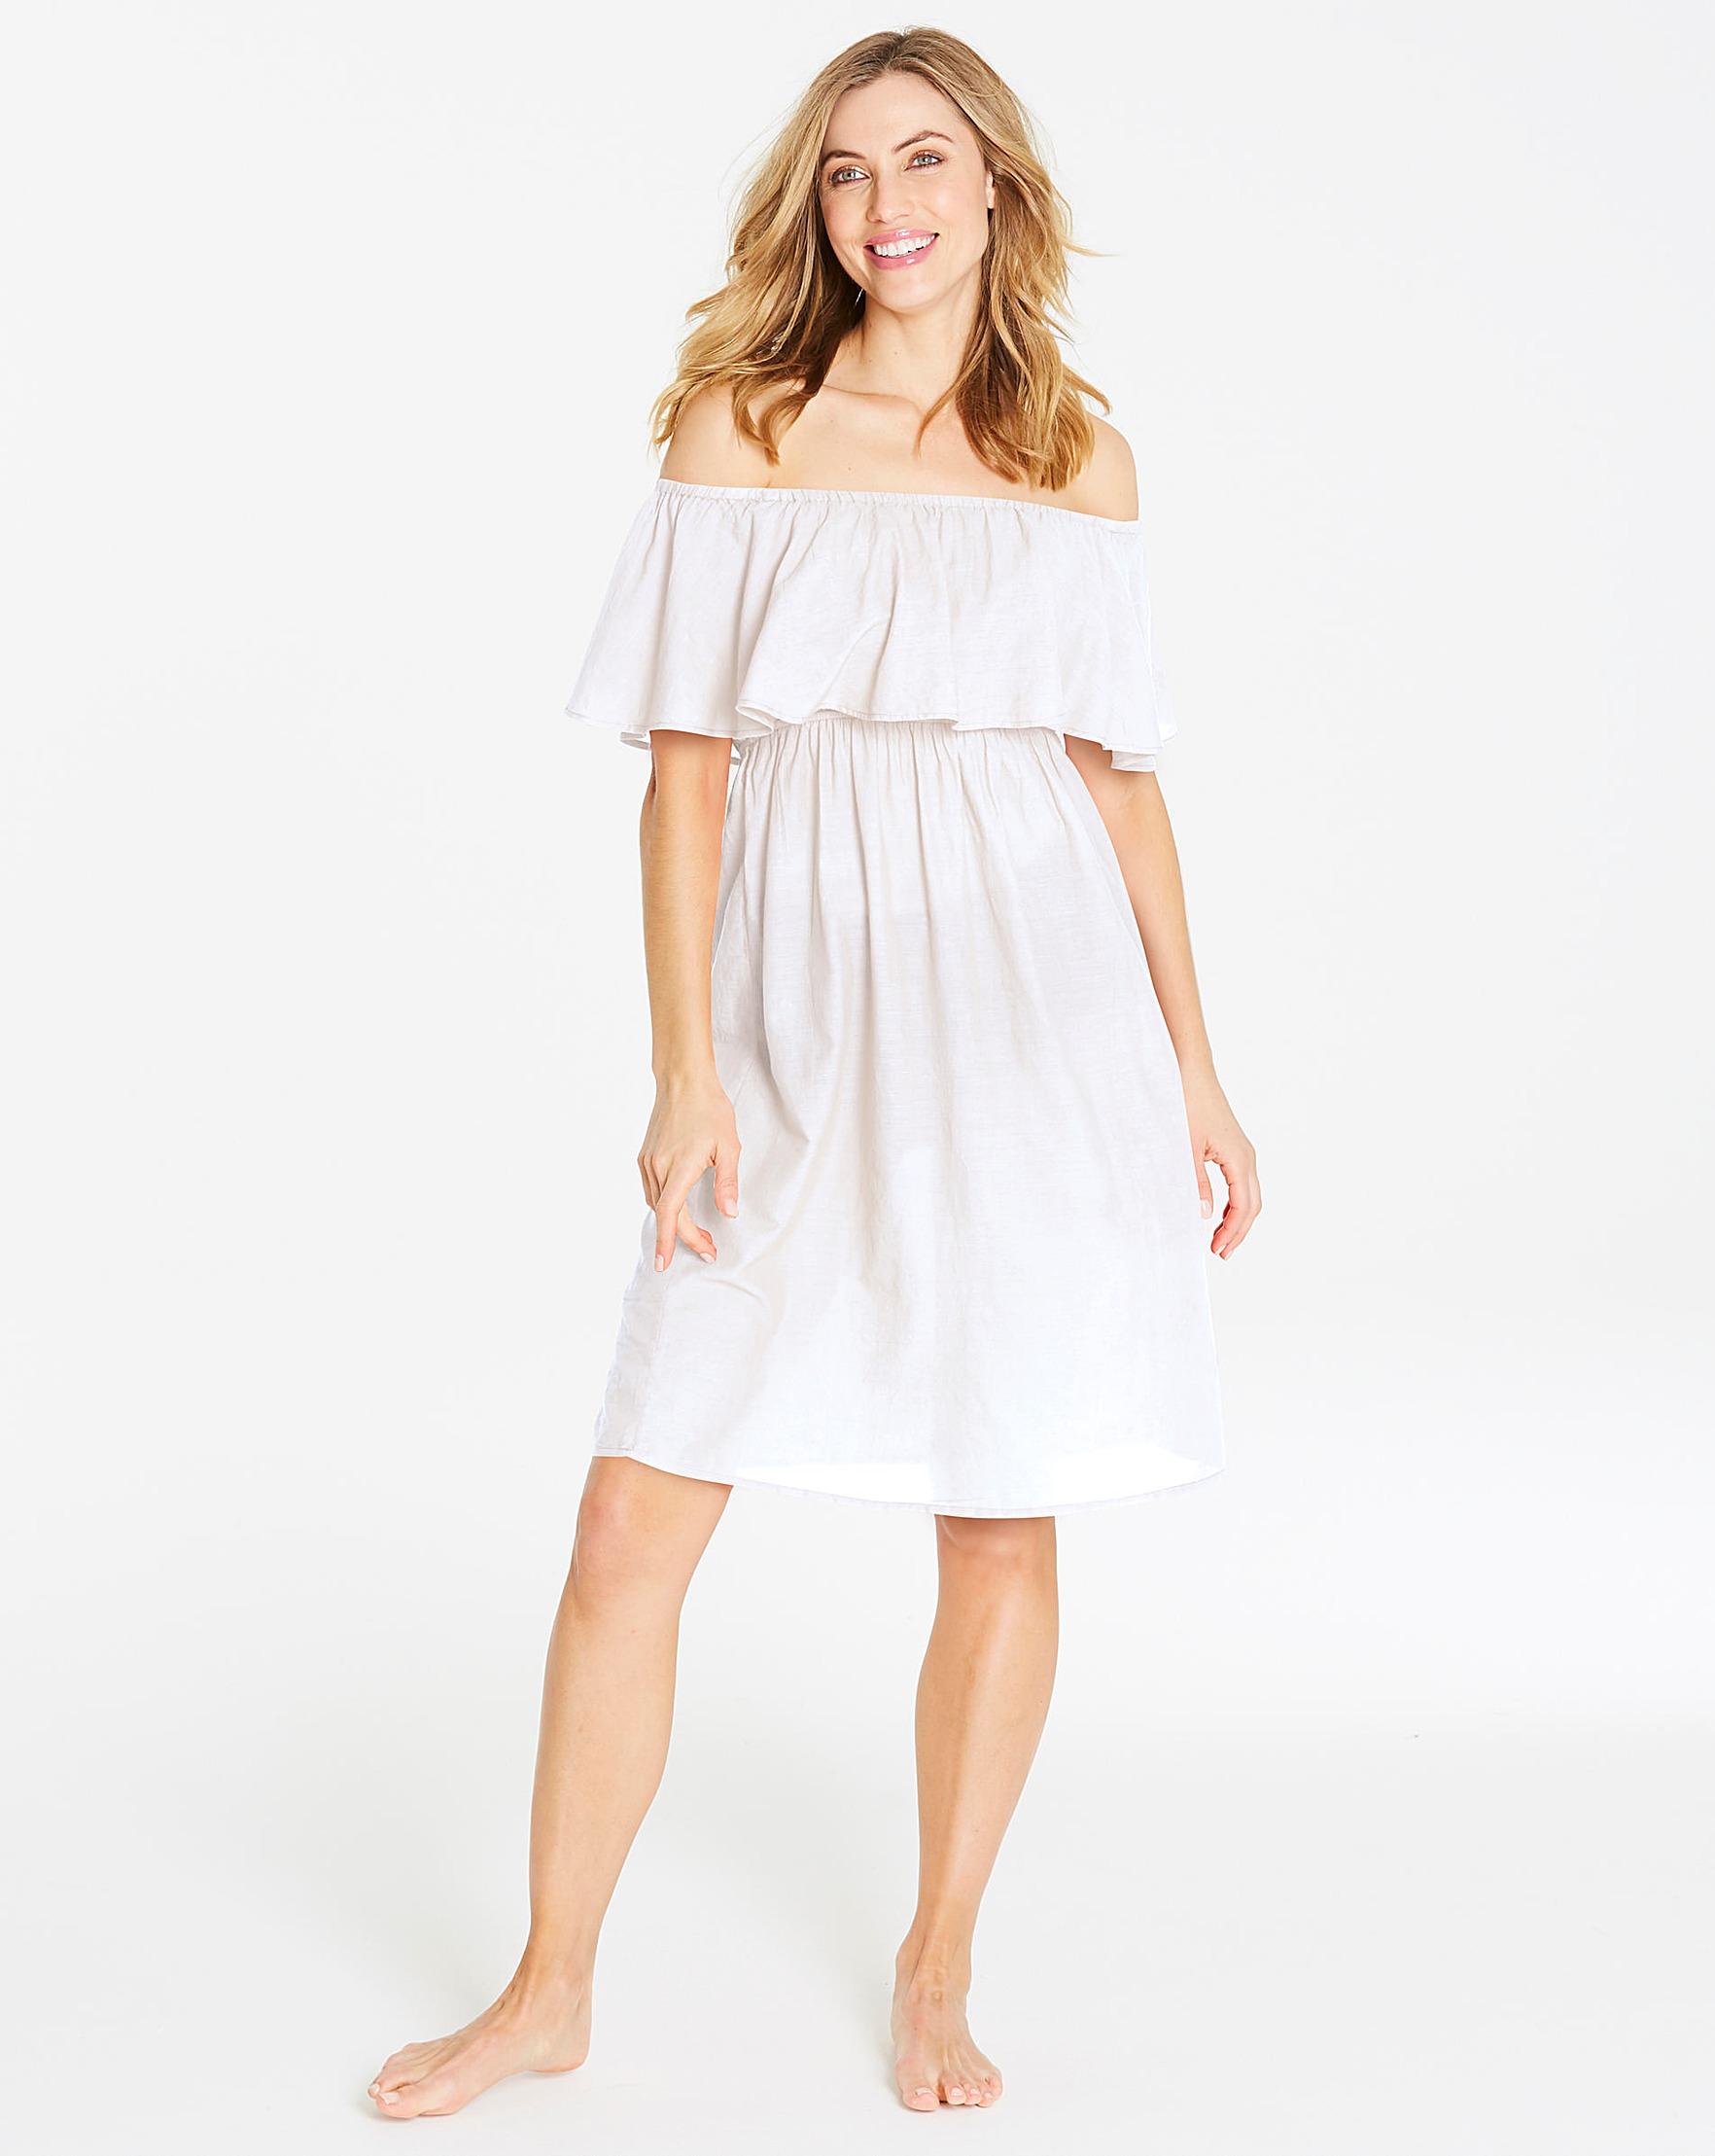 e98672137d96a Bardot White Beach Dress | J D Williams